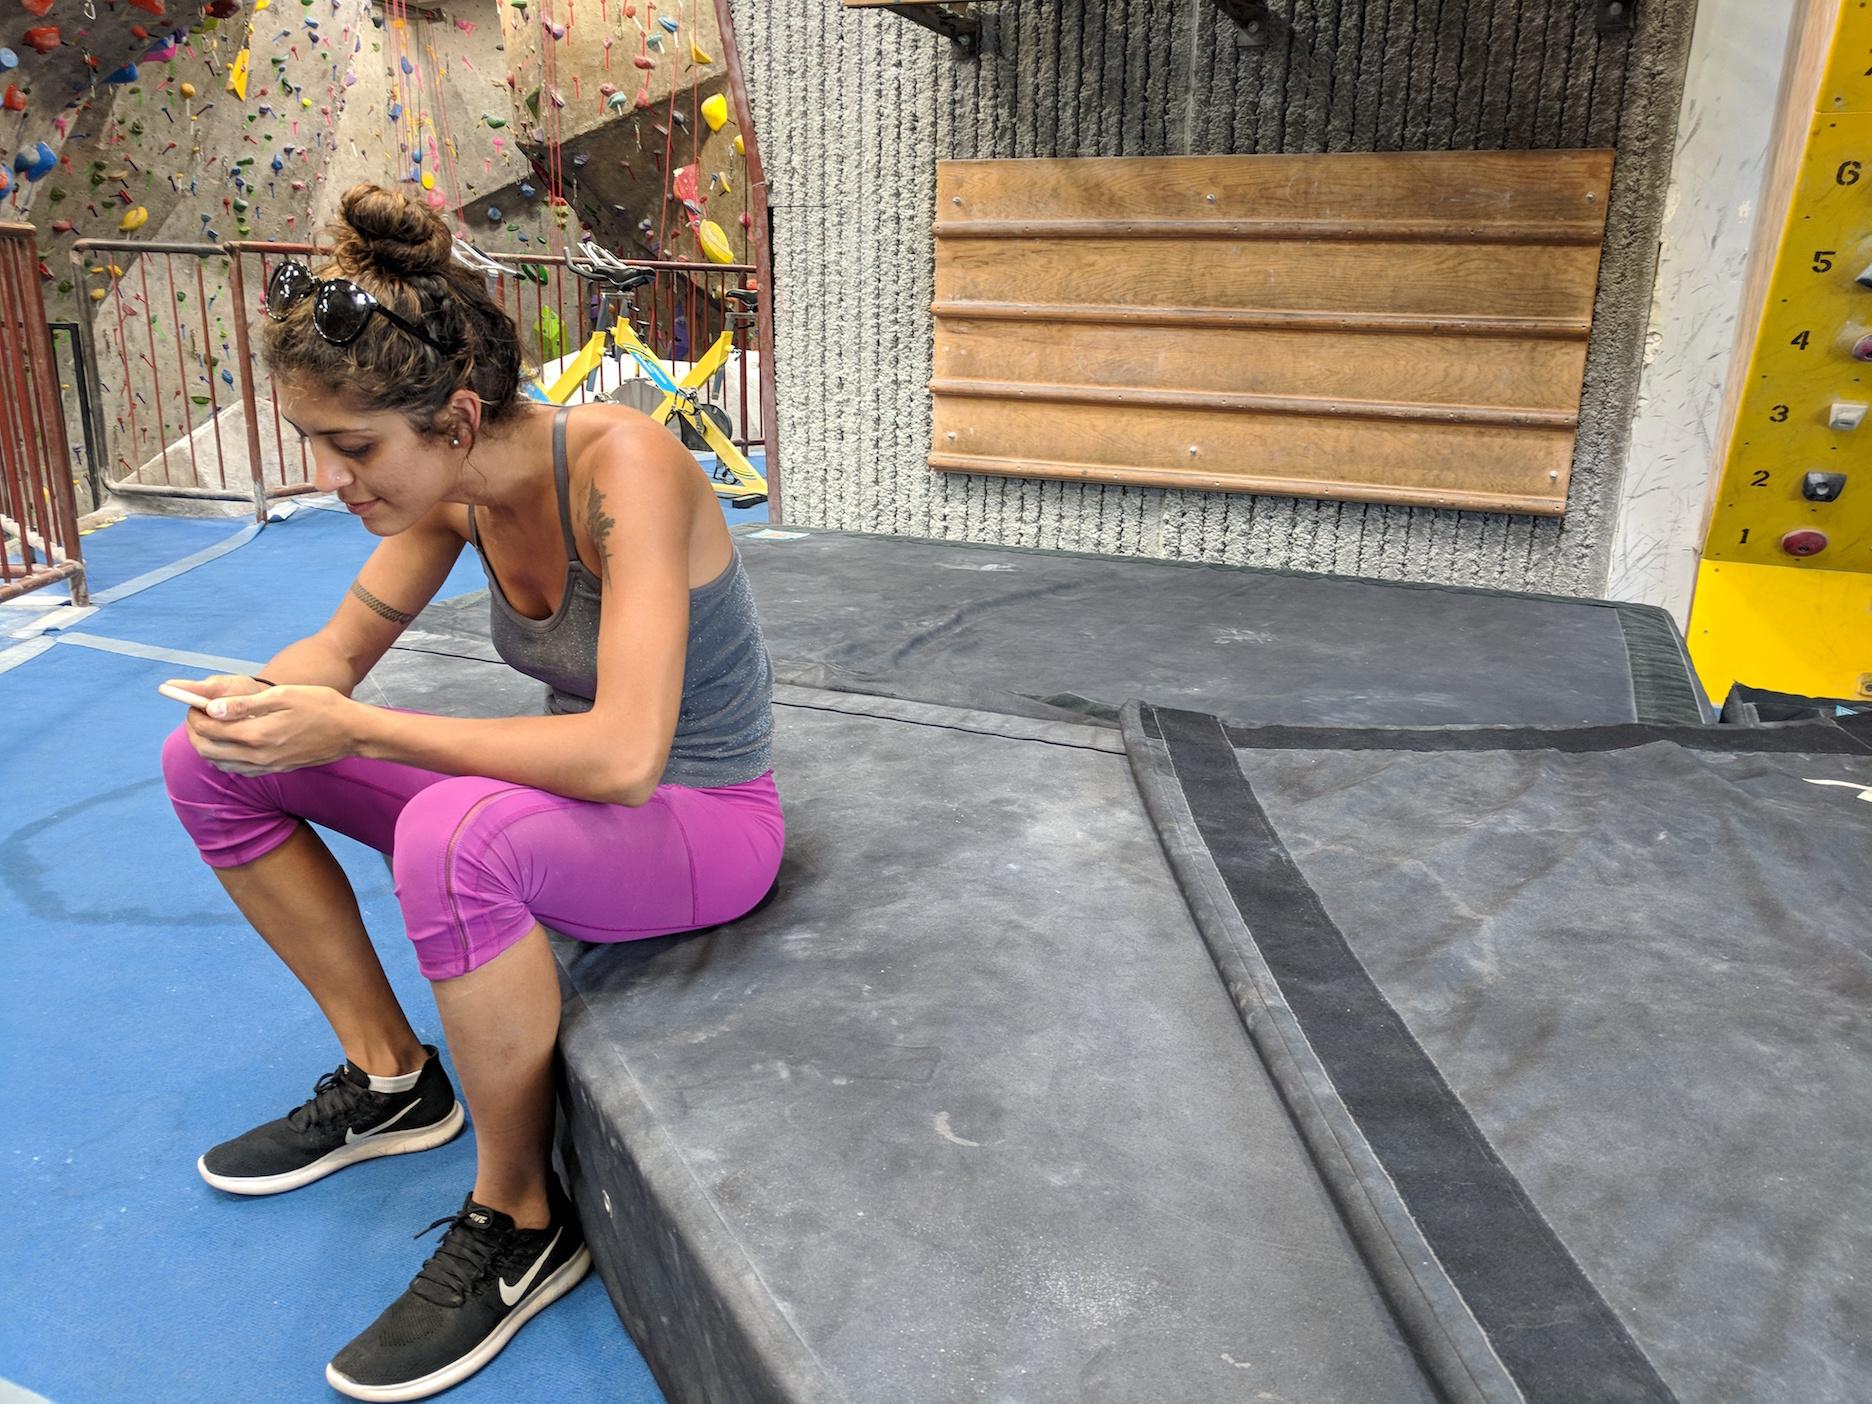 How to Make an Injured Climber 😉